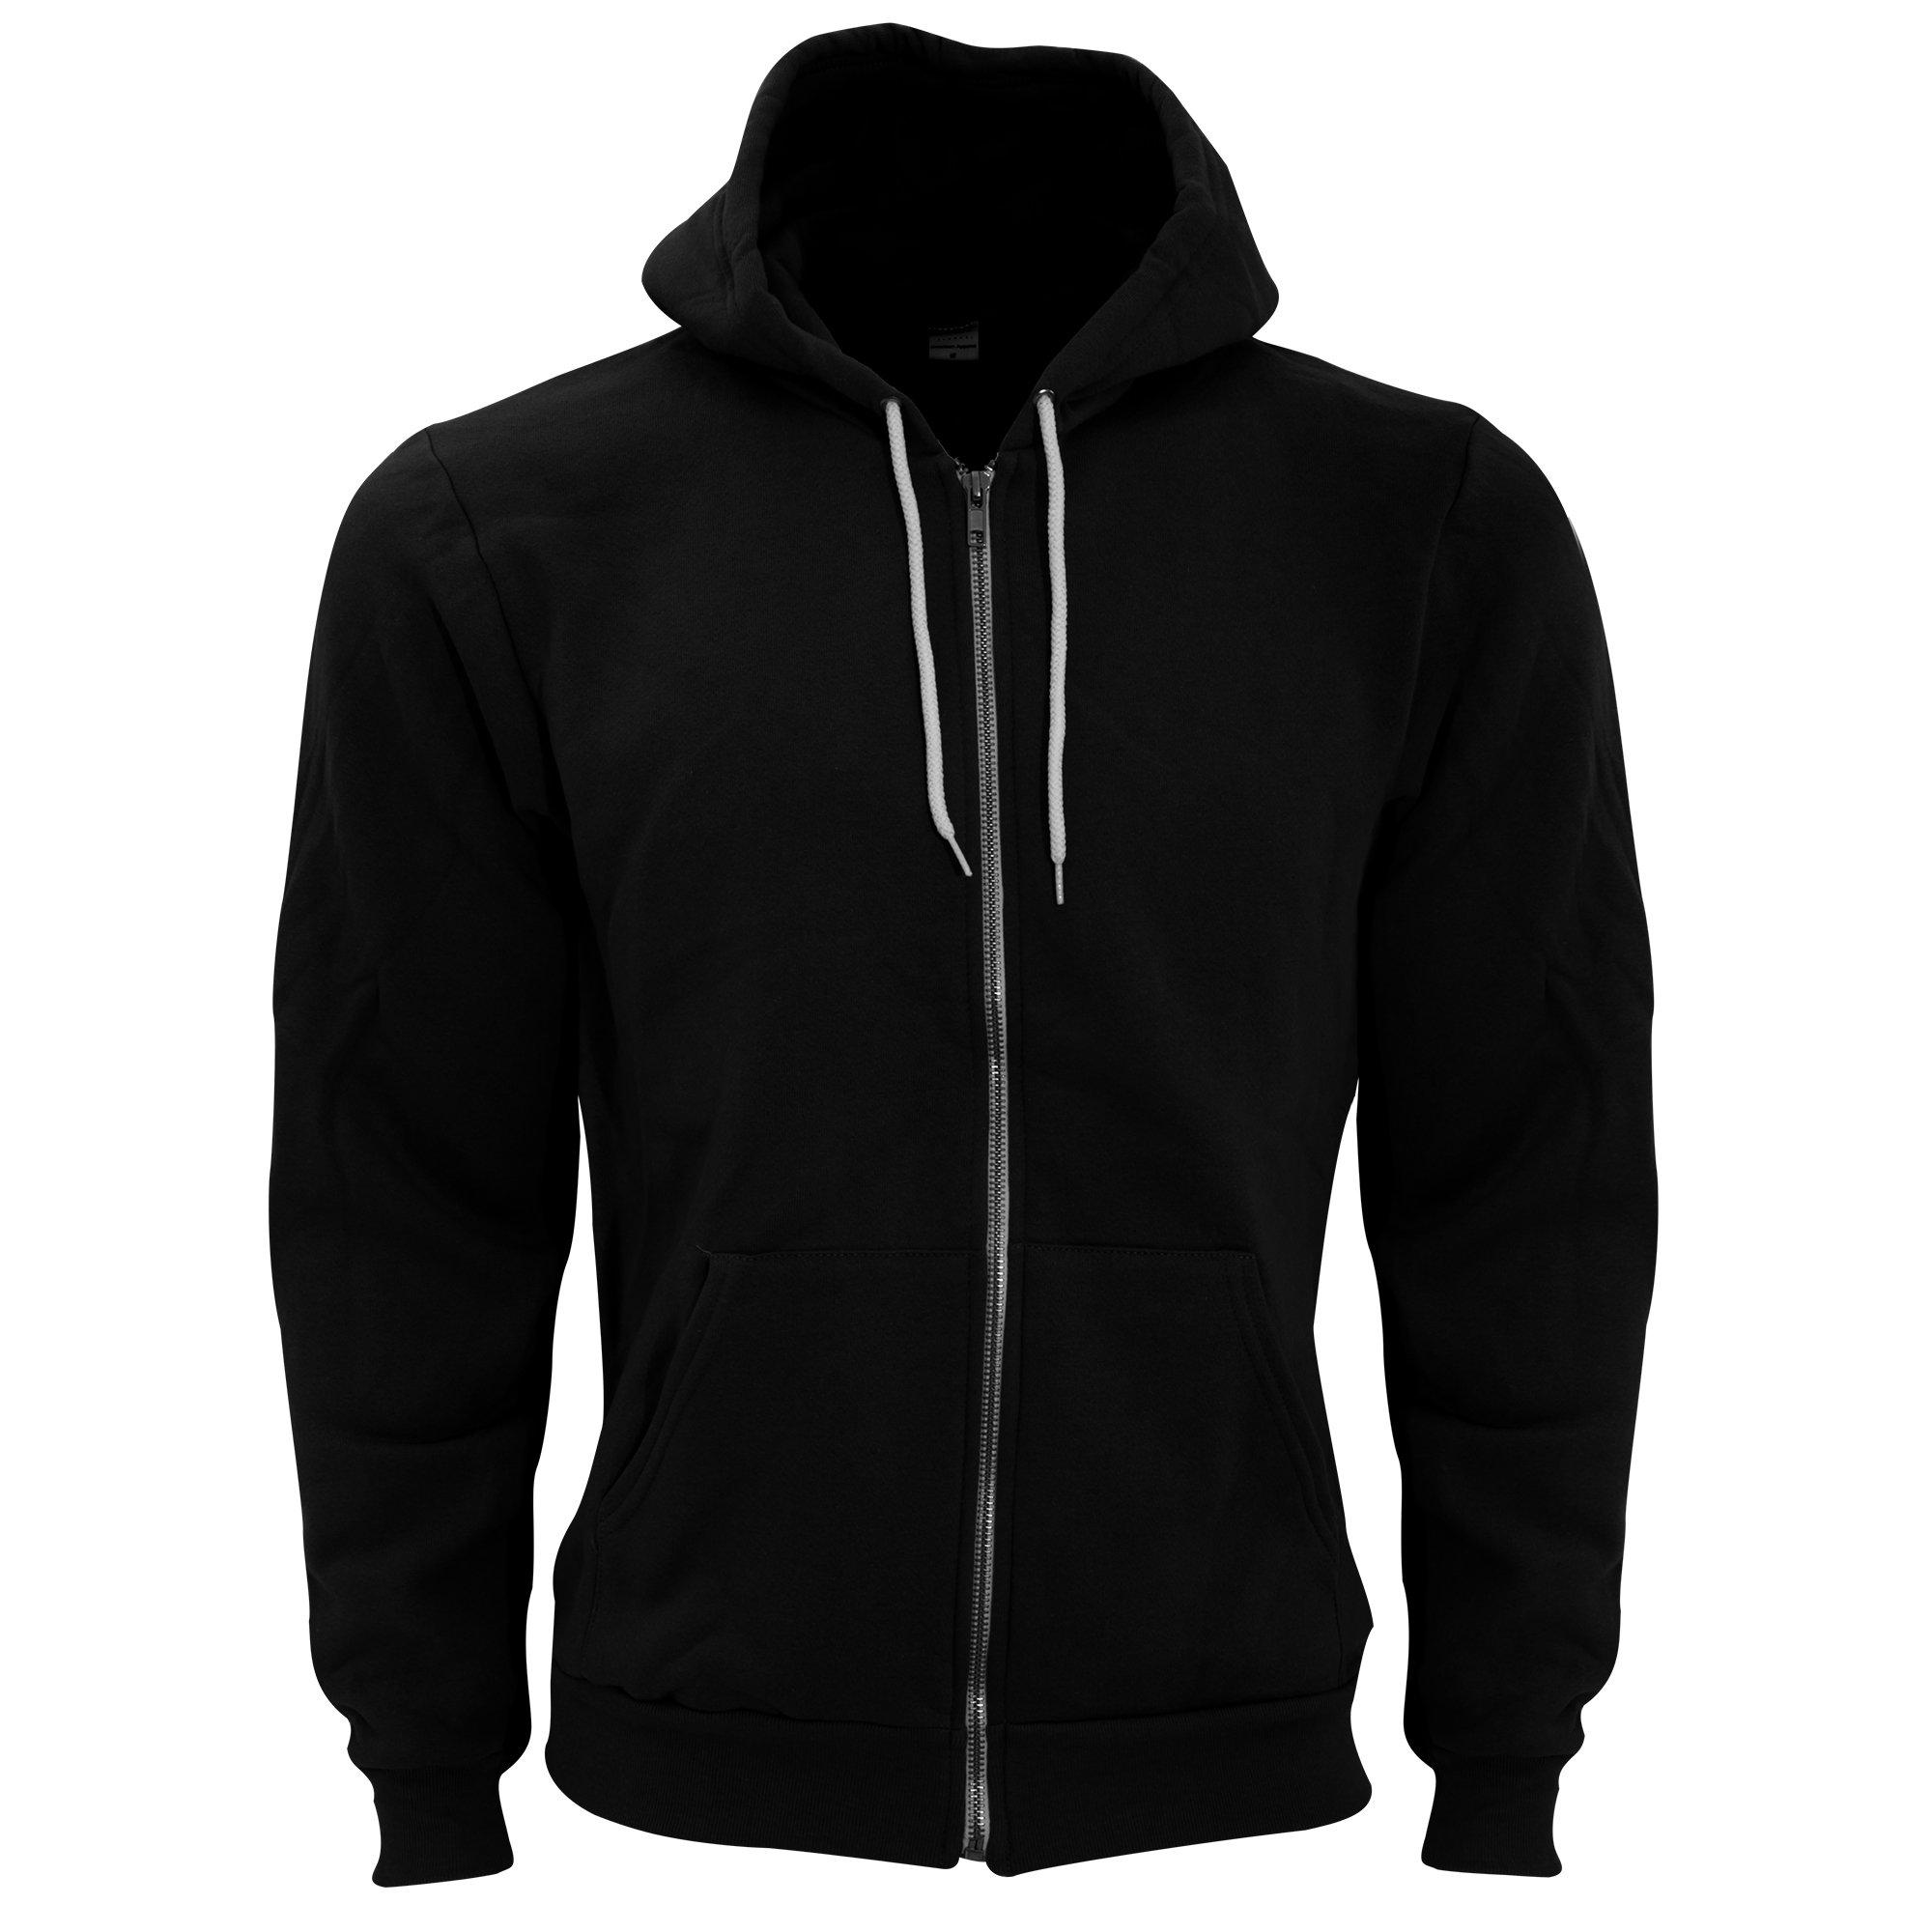 American Apparel Unisex Flex Plain Full Zip Fleece Hoodie (XL) (Black) by American Apparel